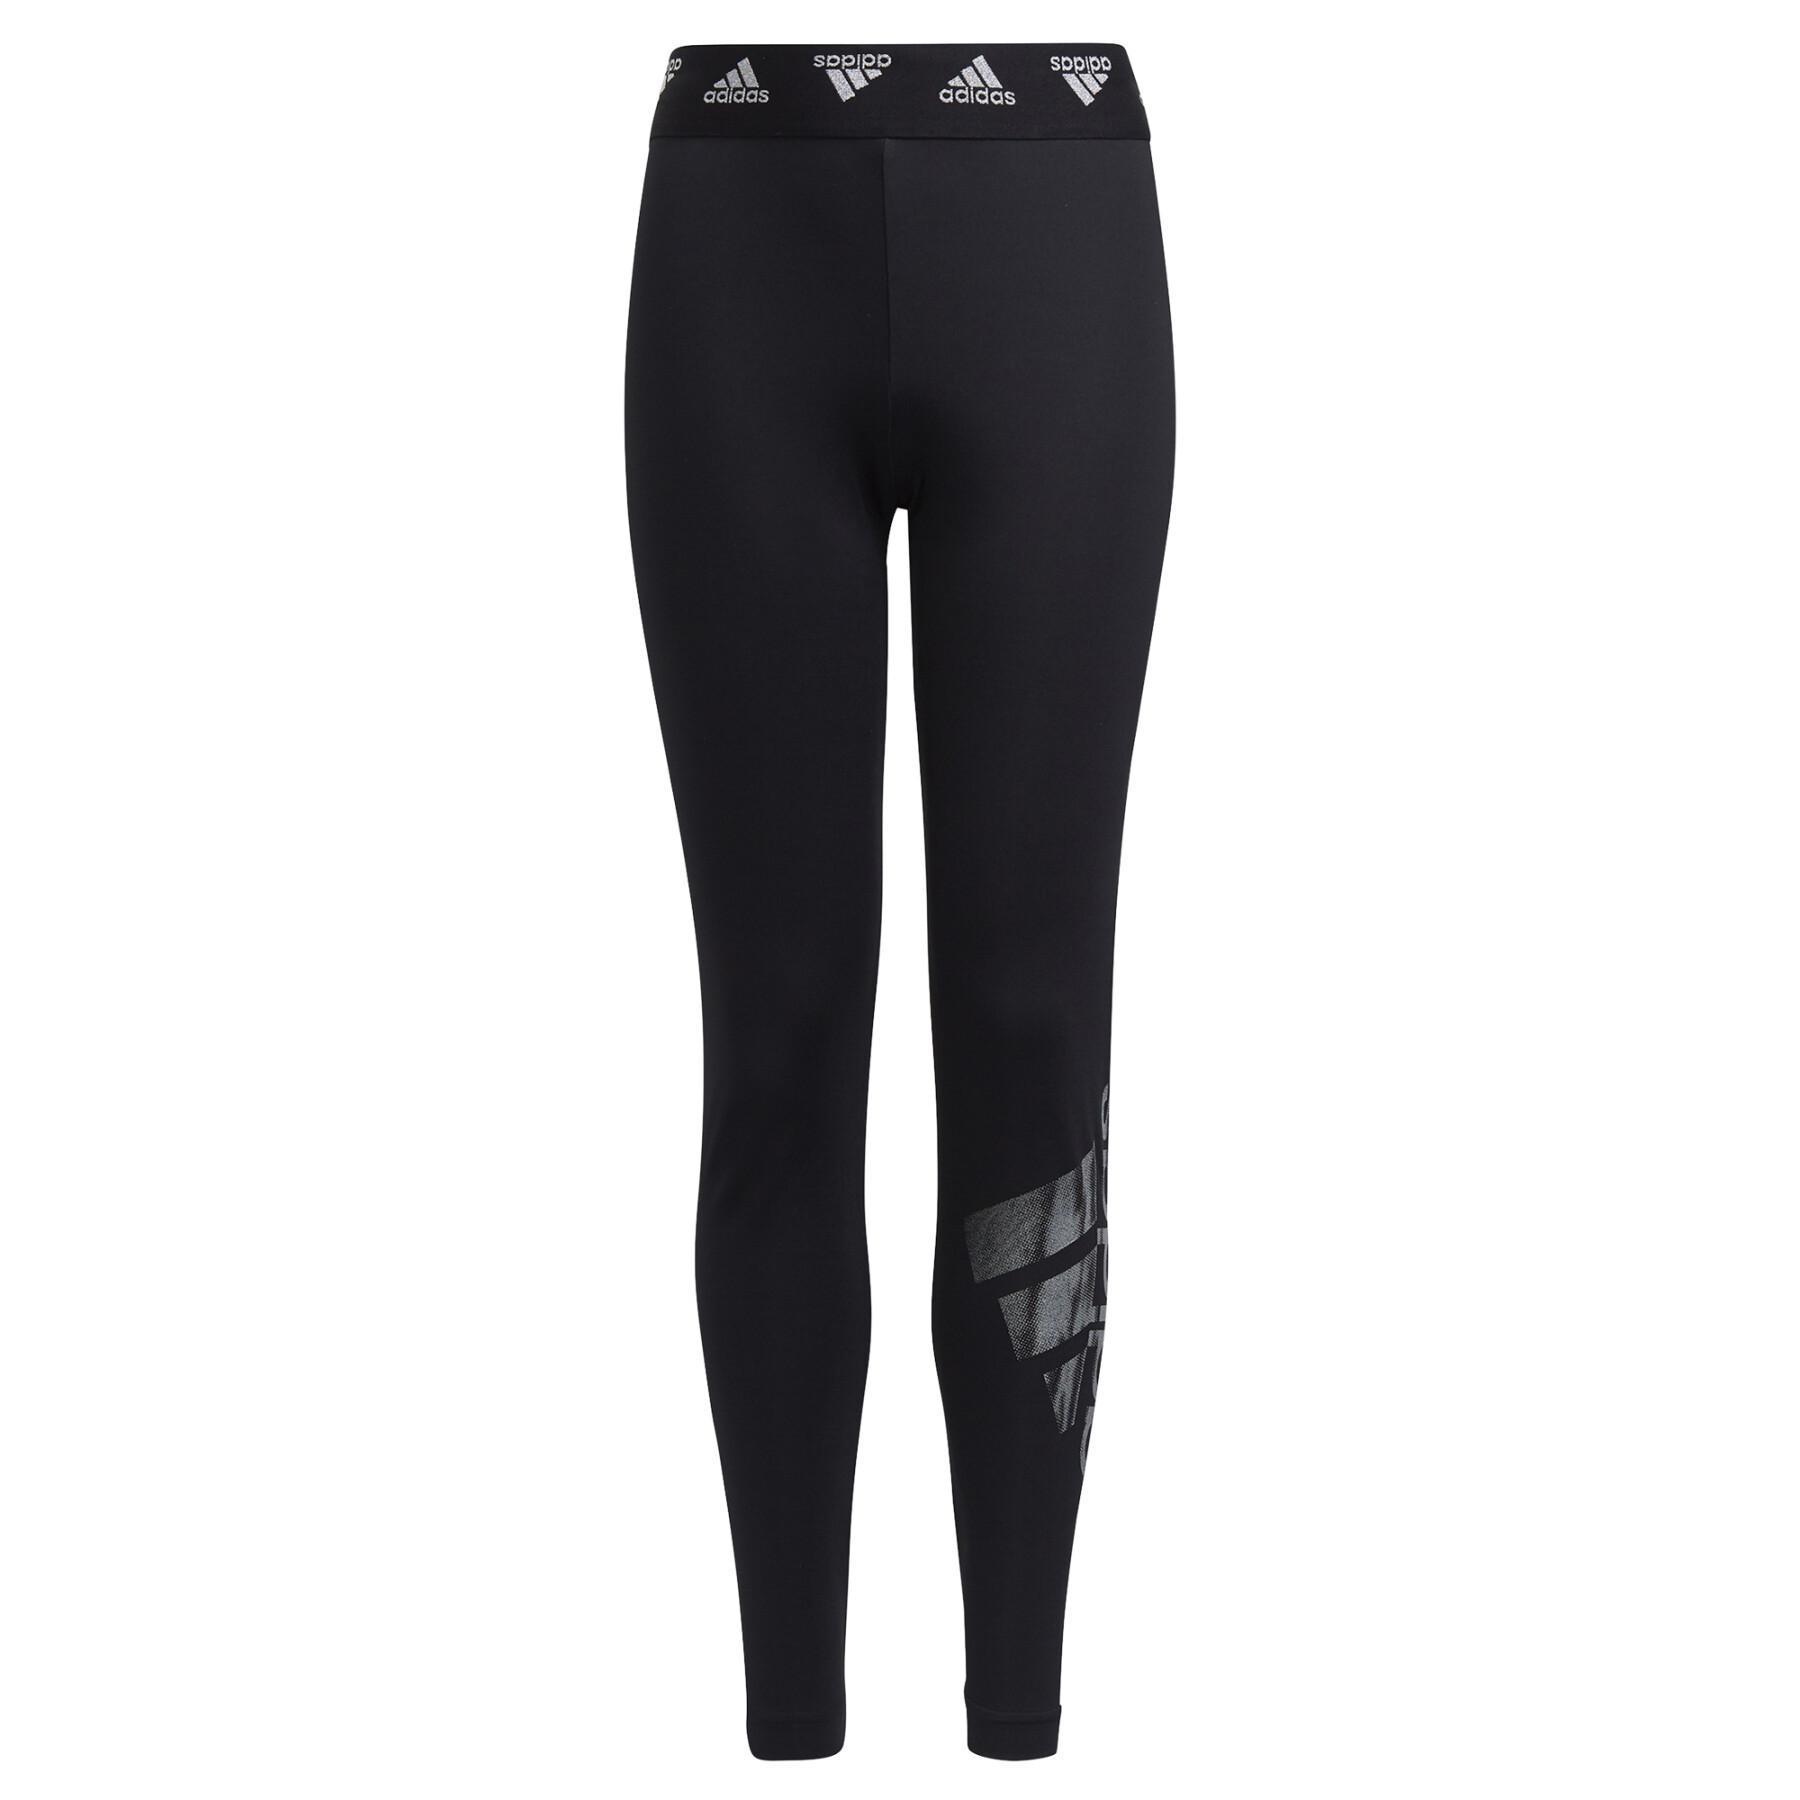 Girl's tights adidas Primegreen AEROREADY Training Dance Move Doubleknit Metallic-Print